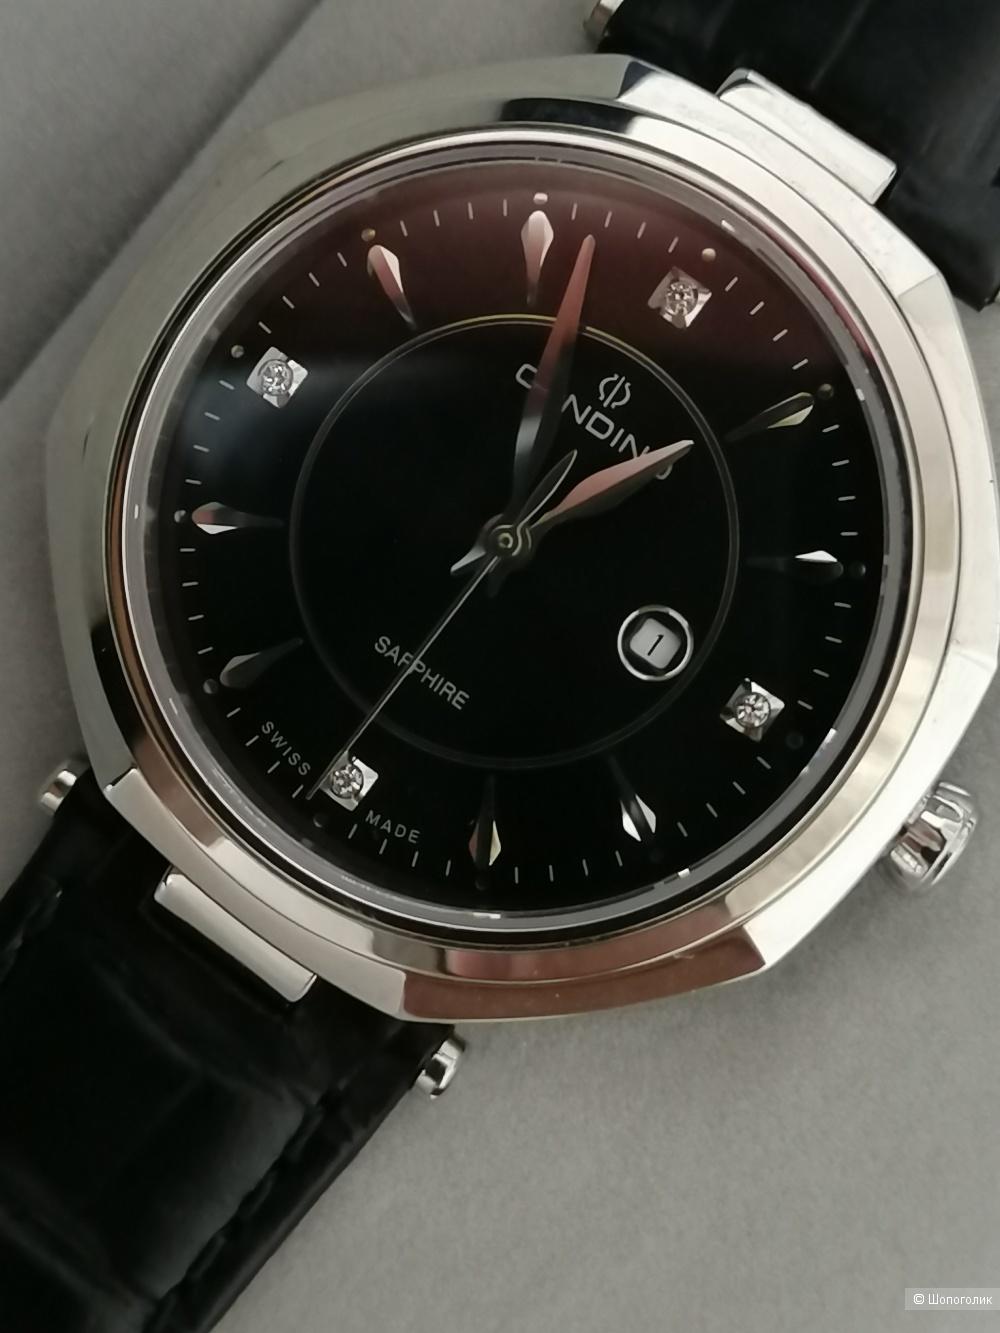 Швейцарские часы Candino Sportive C 4524/4